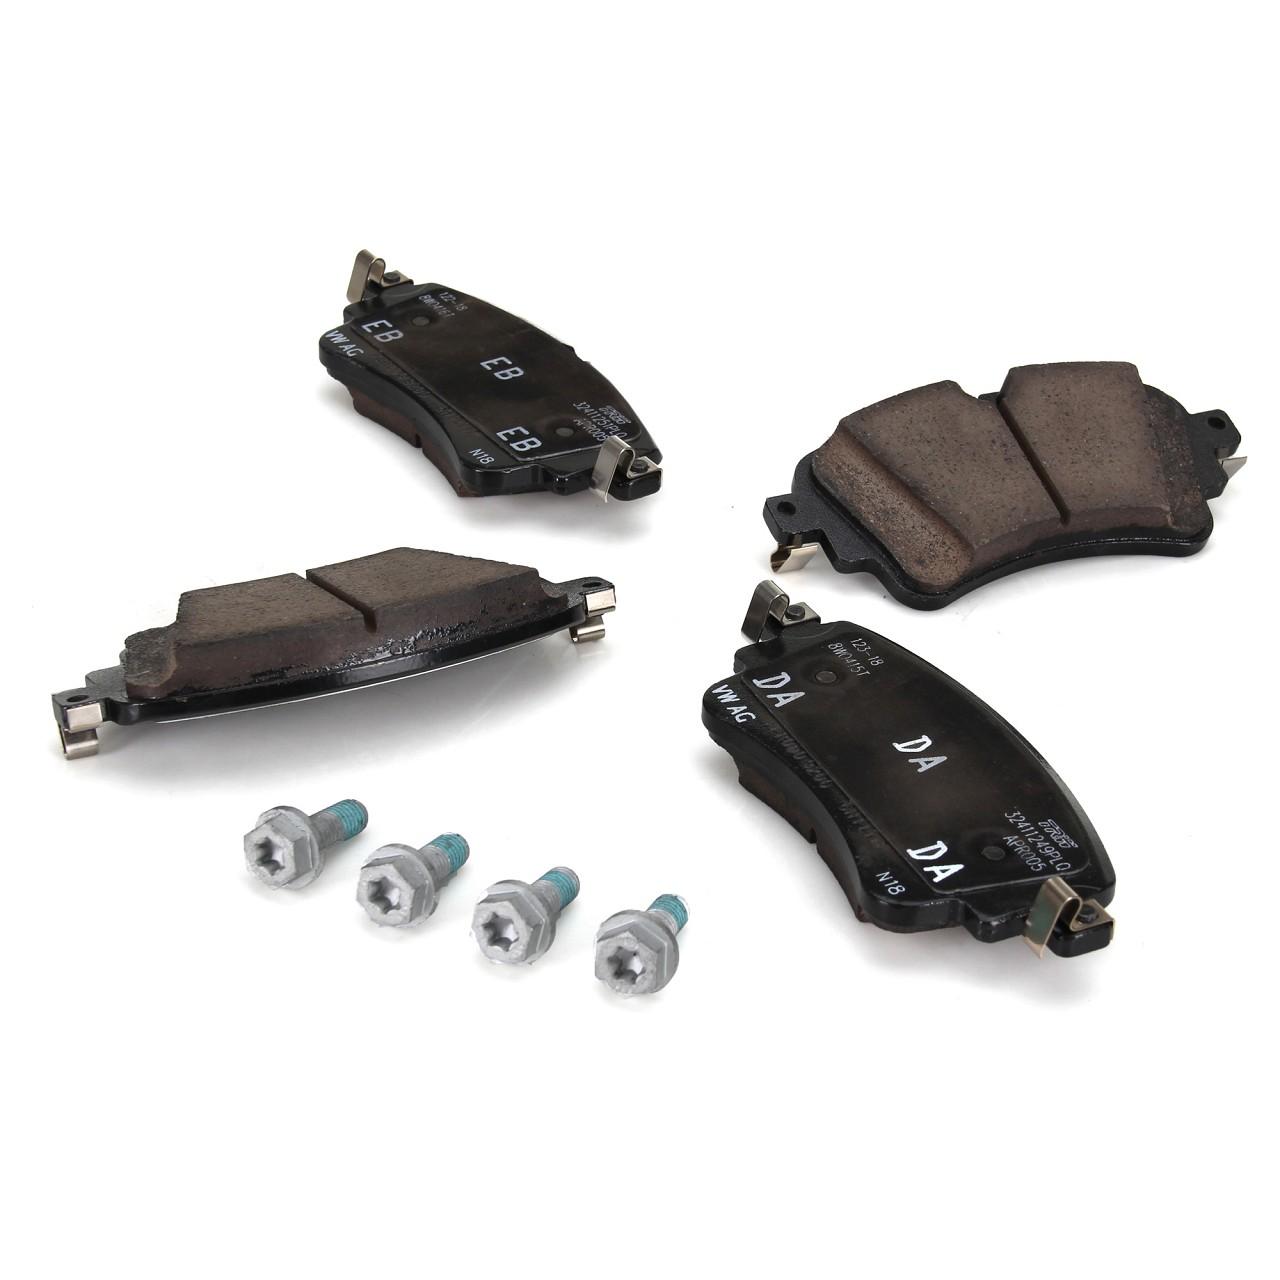 ORIGINAL Audi Bremsen Kit Bremsscheiben + Beläge + Wako A4 (8W B9) PR-1KJ hinten